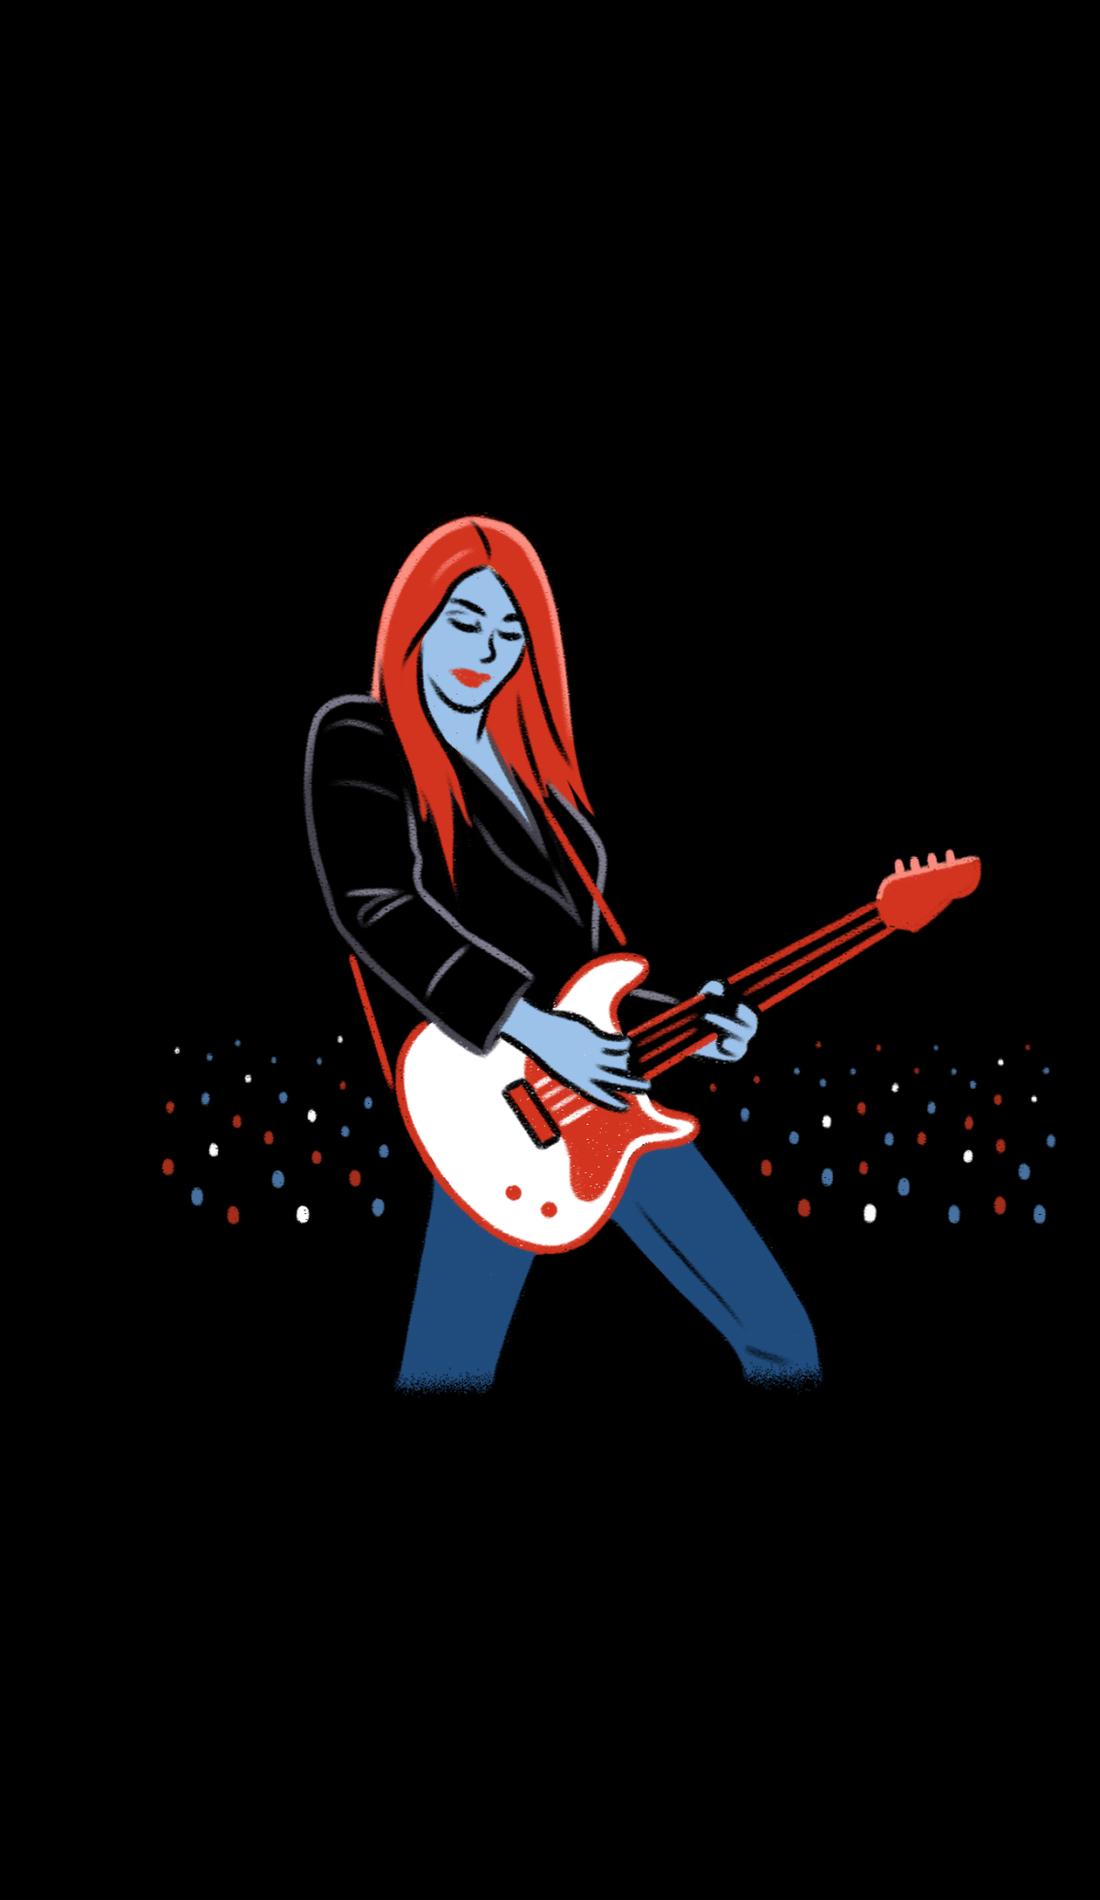 A Allman Anthology live event